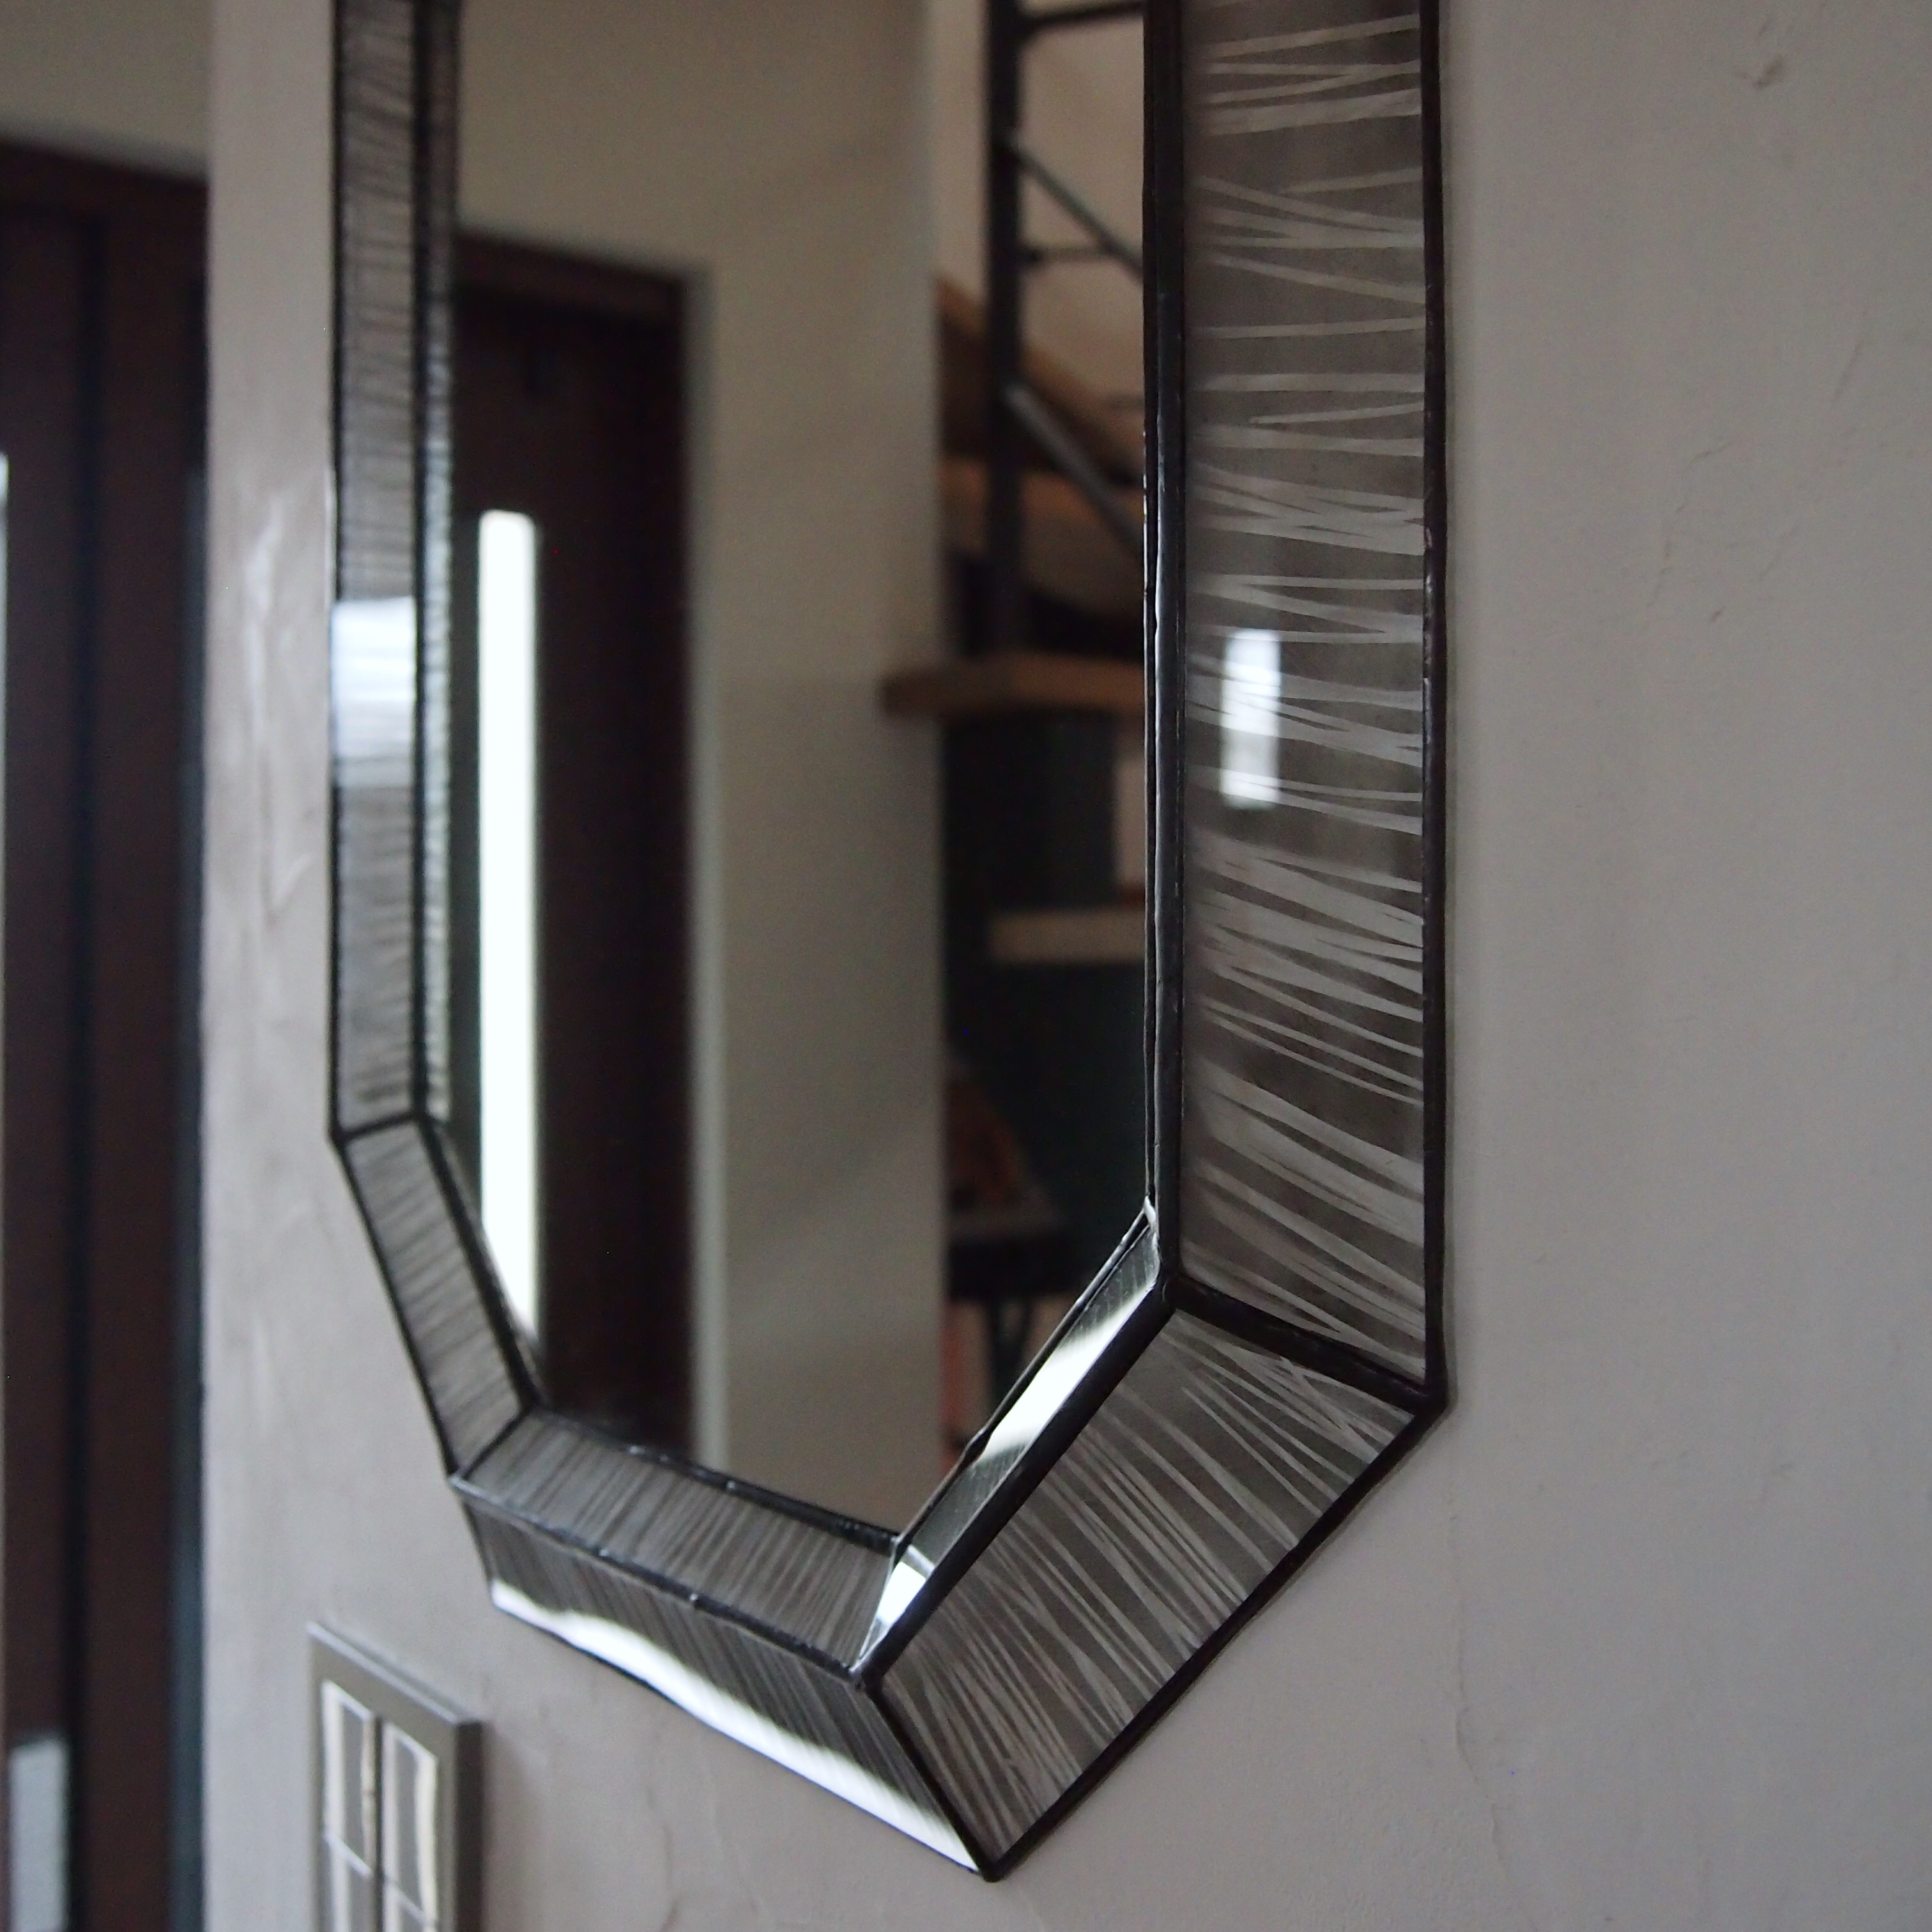 Wall mirror1-2